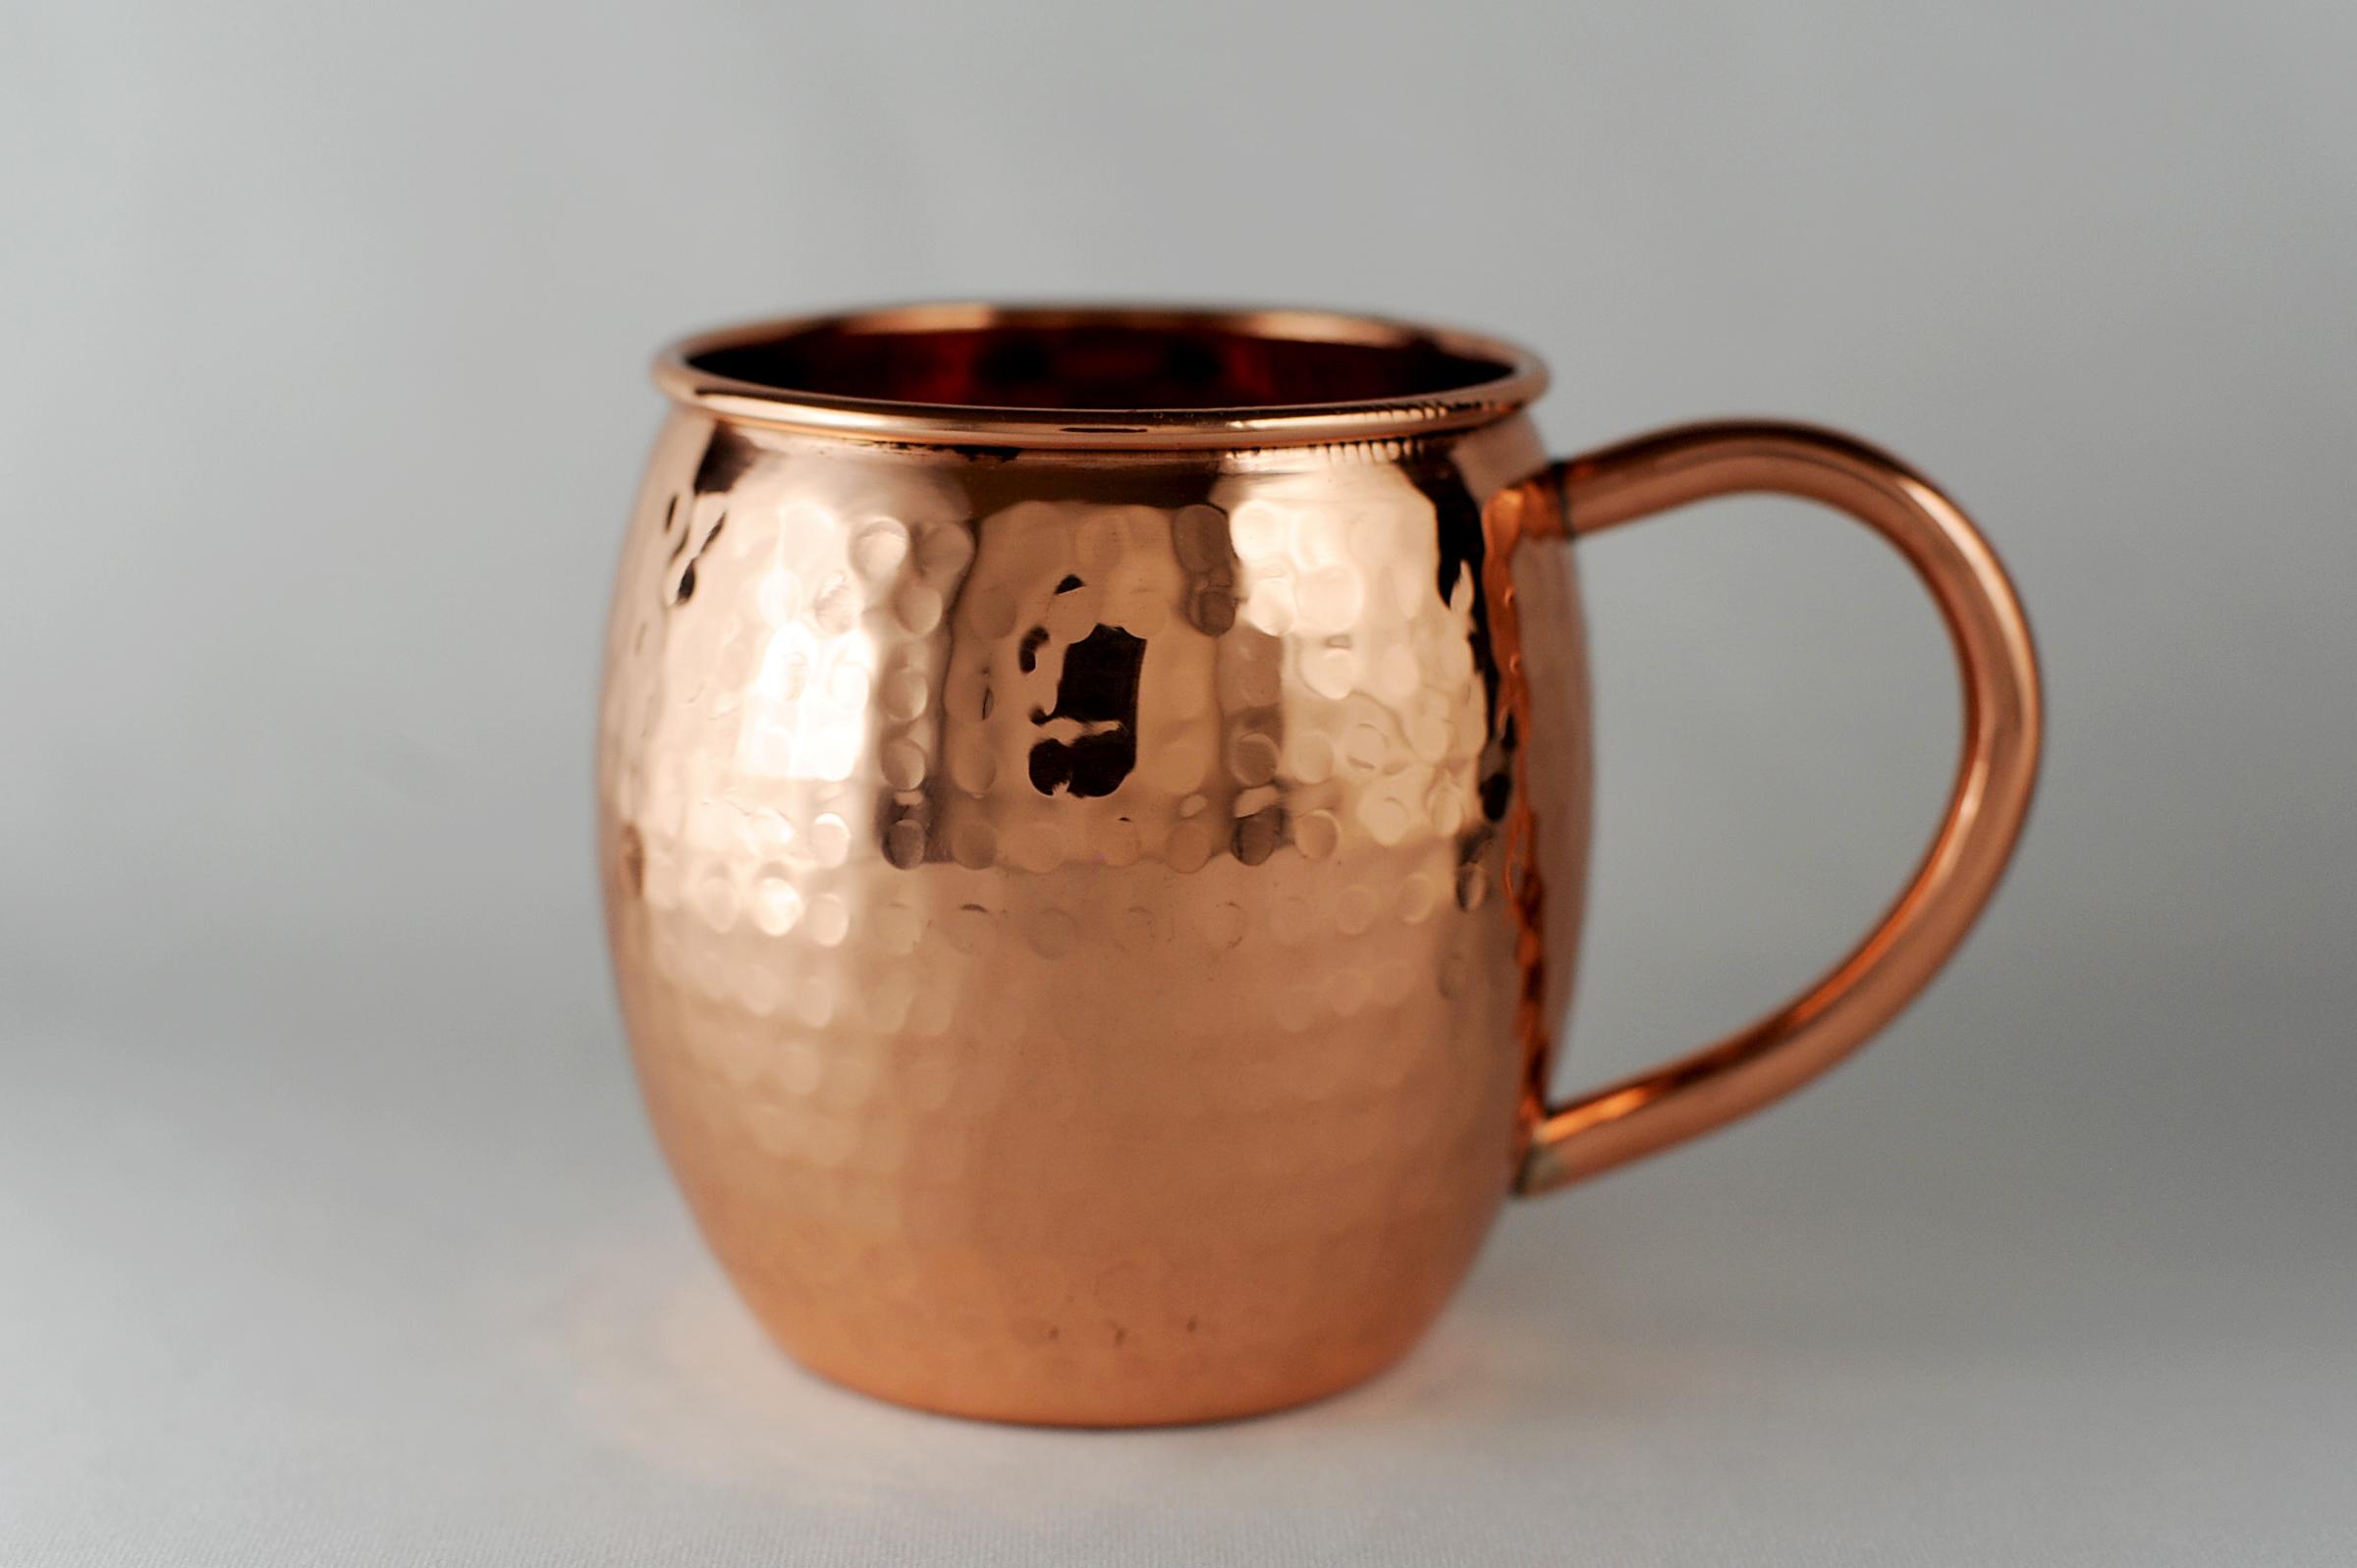 16 Oz Barrel Shaped Hammered Copper Moscow Mule Mug On